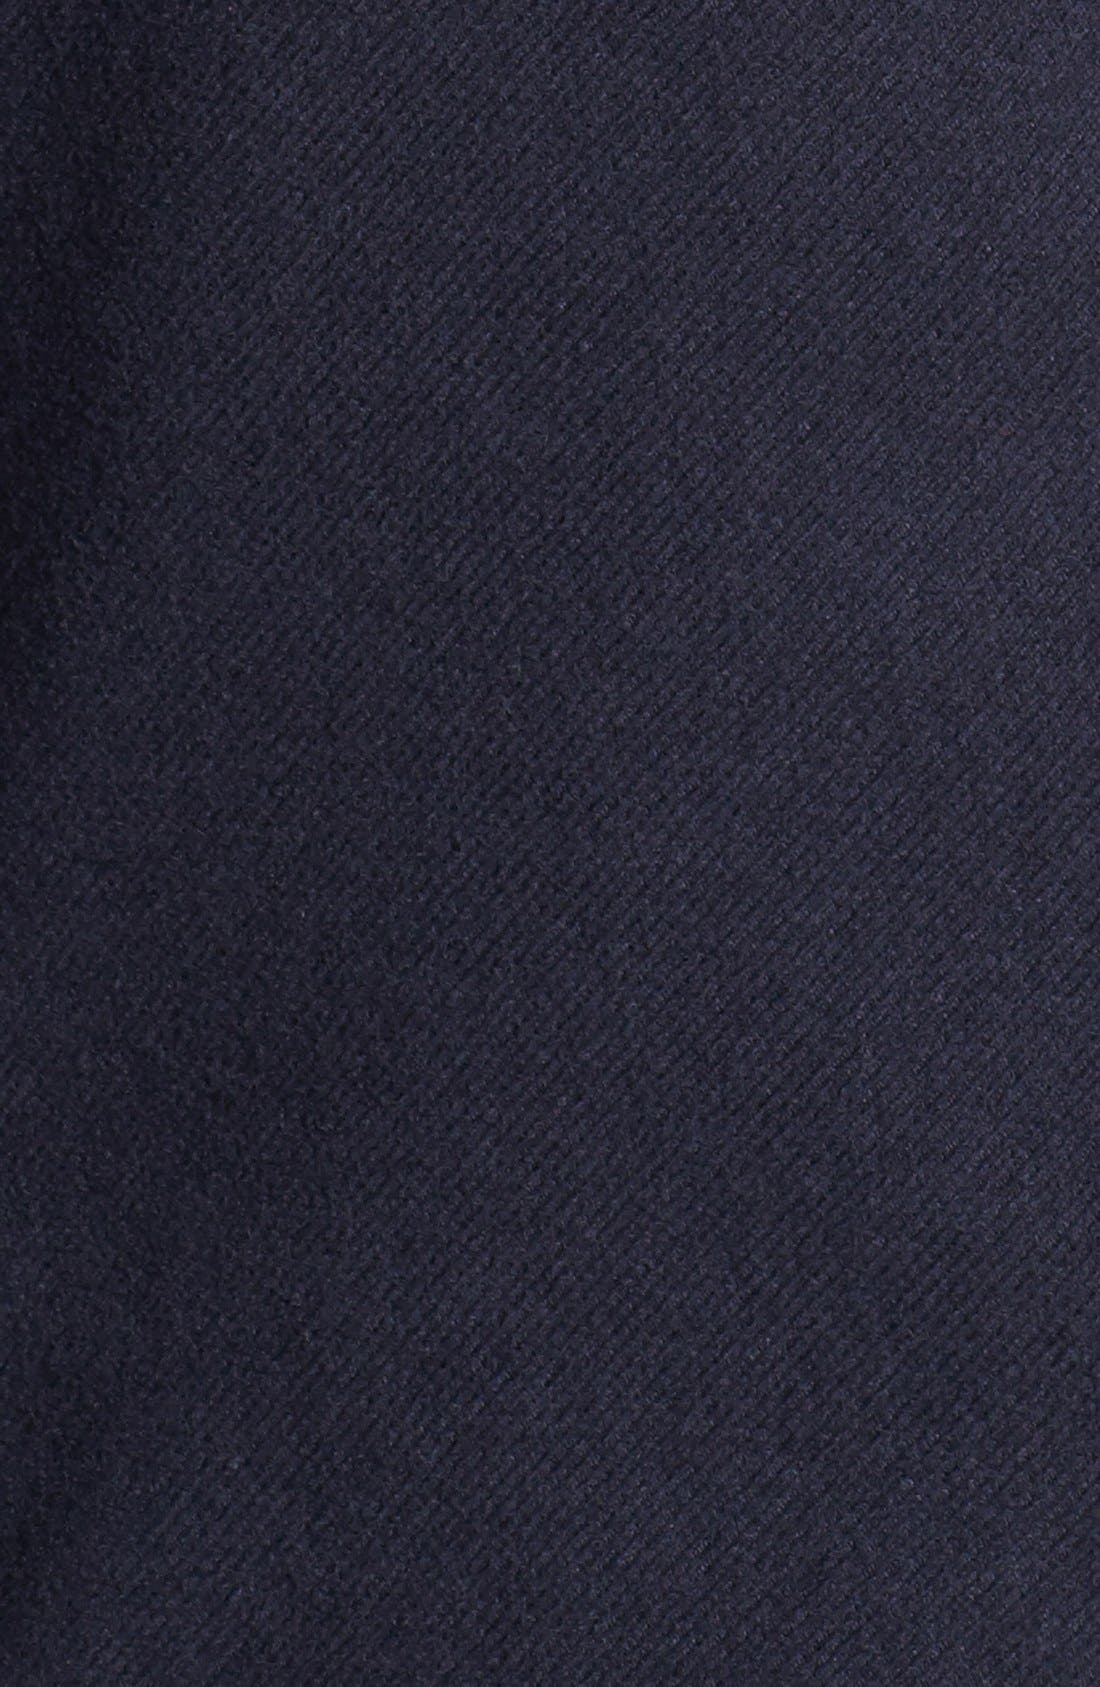 Alternate Image 3  - Canali Silk & Cashmere Sportcoat